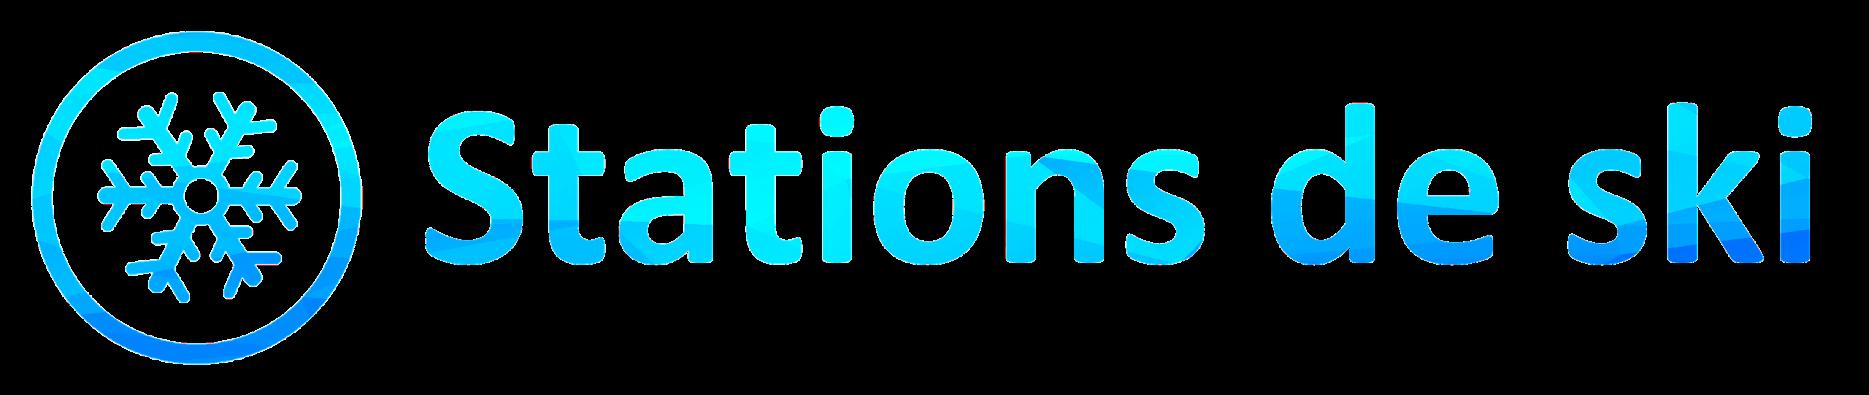 Construction télécabine (TCD10) Solaise 2015-2016 - Chantier Solaise - Page 2 CHv1NV9zrsBfhA9uSEfpZ-Ojw9iVknL2TgrD-tQZOcFpBdlPB_ufz-BSIEgficpxJNO_EK6Jh5KIBc0qj34p-xulPhnhbn-6ztpD28KBpOjb__79a9L7iVgqt2FMgc-weTOGNsPveyh5tCi7hUIaIX1O-Sppxc_bJsrctF13JZo2DqXftioZnNJD5oYqm8E8gsgW0OHpHr7bYoK3X9gPtEIdXkeFOAbFs5CzmfkO_zLrBNpRajCdsJRwViyIIp6iwuc3ACBWyFjeU05tHIdn8aZyk1upV2Z4waI-Oh3PE-DnedGz8z5WSljc18D-iglCLpDIcYCZ0tnfR2AXVVdABv5Wg4AeBlhuPb3ffLzOlKw5VFA5uaa7MdCYp7BPuvIW3IGPUqHwuIybkCC6209R-VdGJiWIi497I_vSiC-tbKH4RtOvMDhHFdSLRHH4xjwod3qgvIRKAIHLrMiZwdxJQWqe3pjtxmLoDQLJce0sXgK5LyS1d46urXLg1Yen6sv4dD5jP8oZMuqRX64bXTfkENE=w1872-h395-no